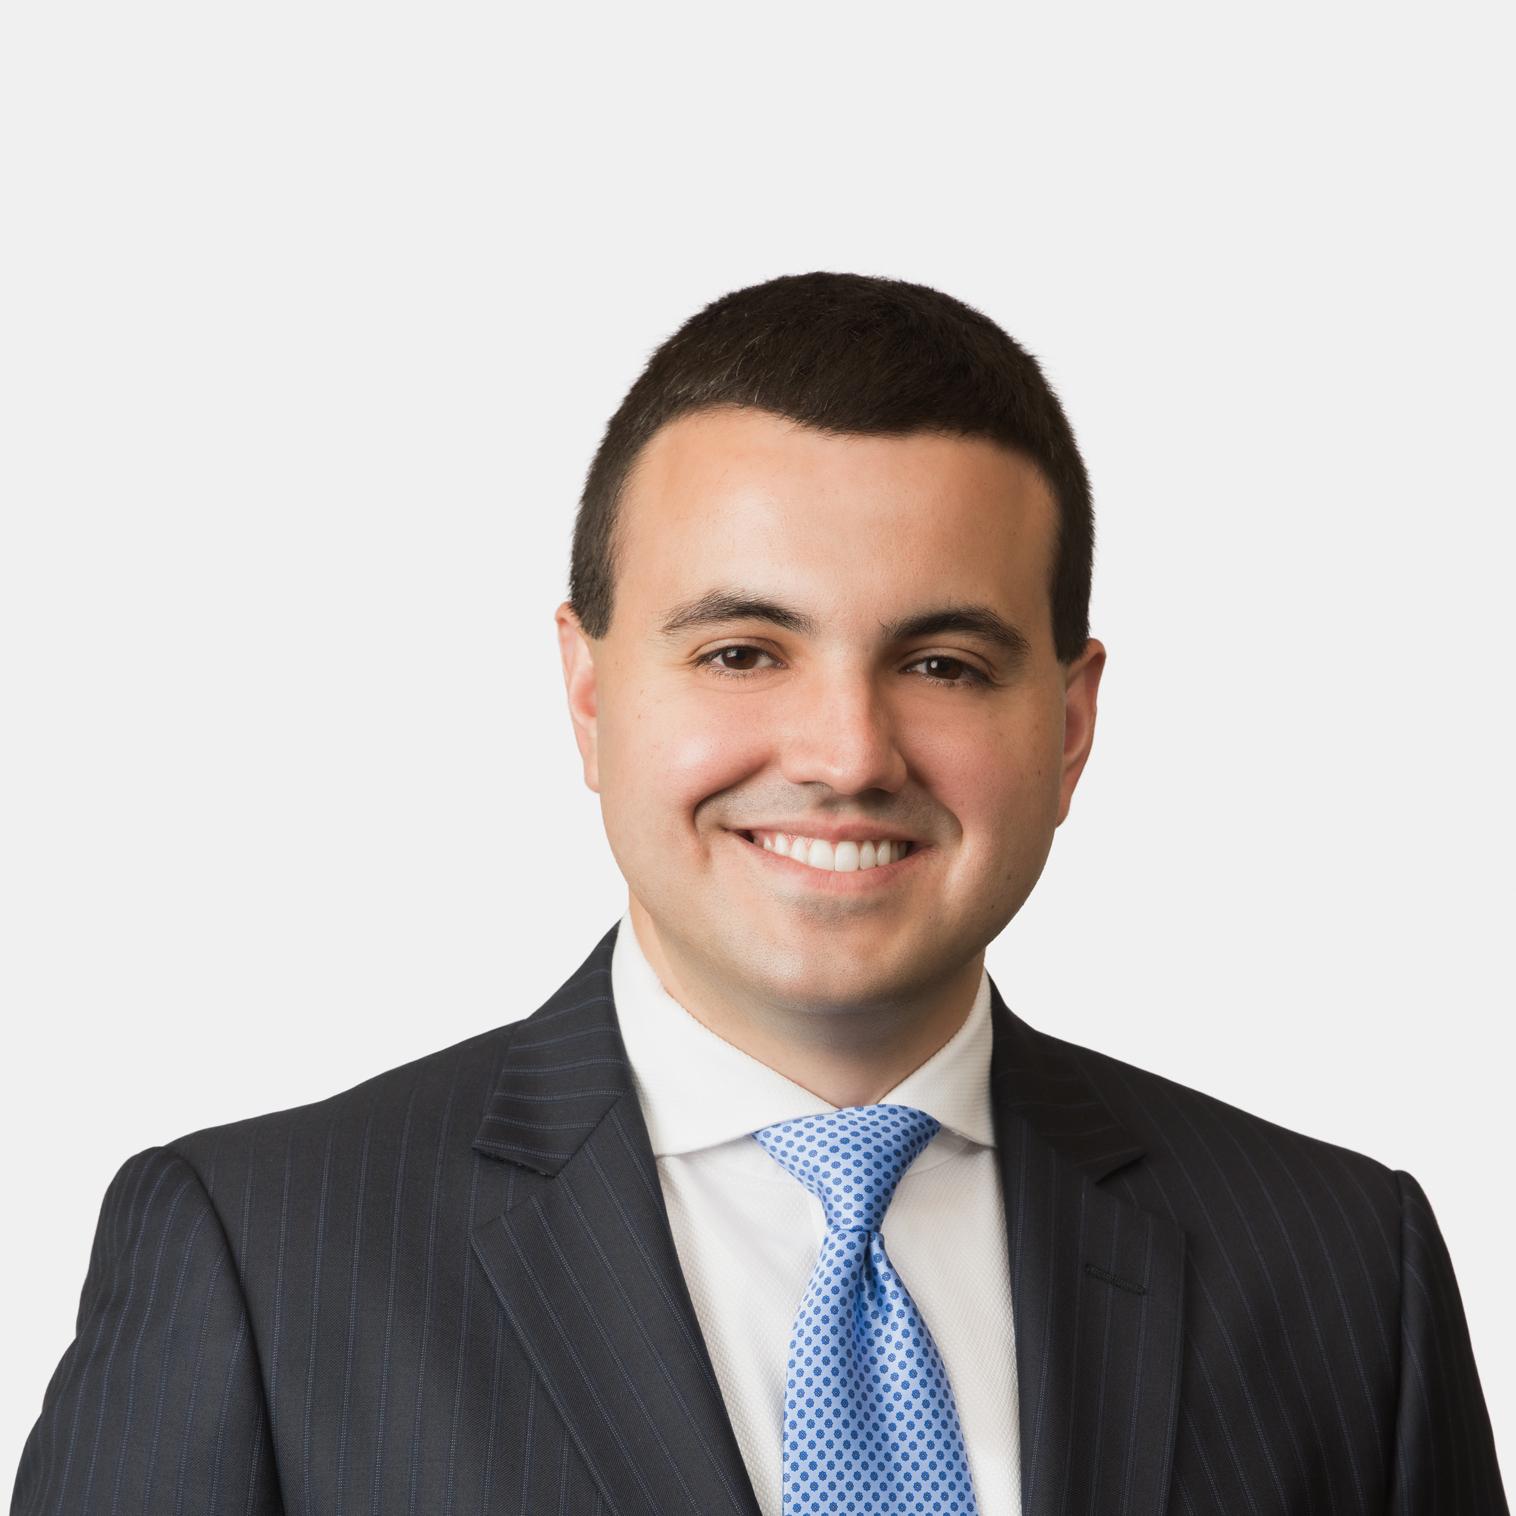 Kristofer D. Machado